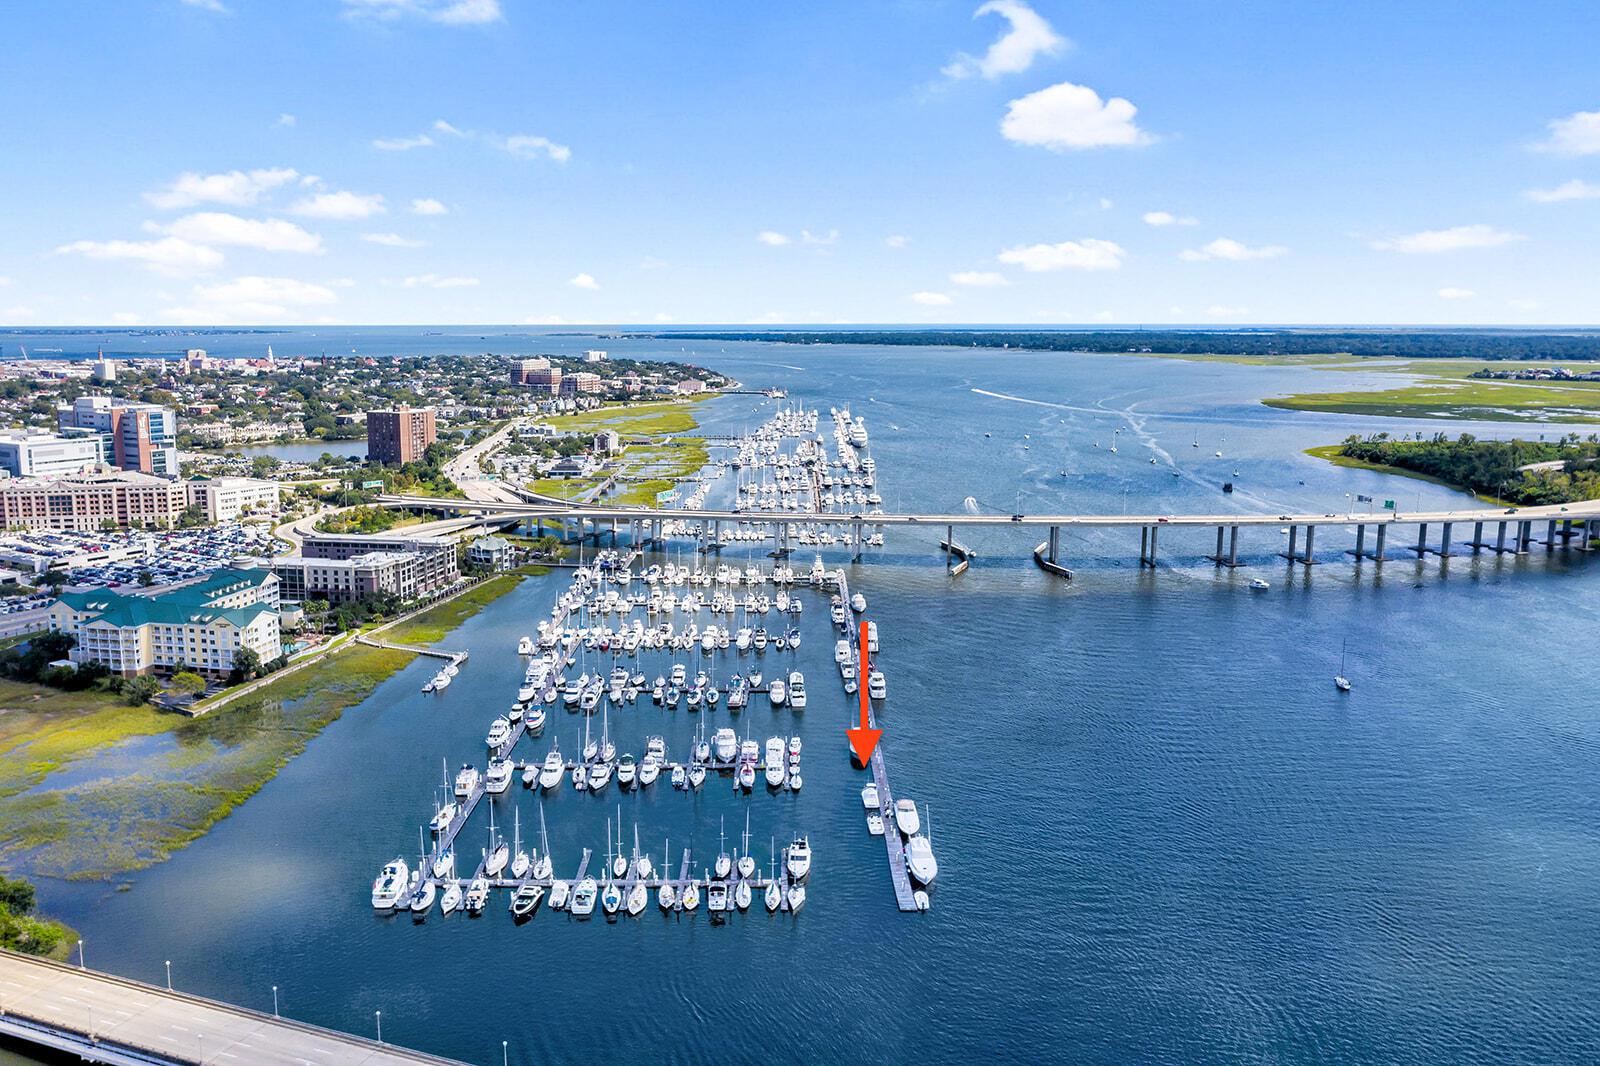 33 Lockwood Drive UNIT T-Dock Slip 13 (Lu220) Charleston, SC 29401